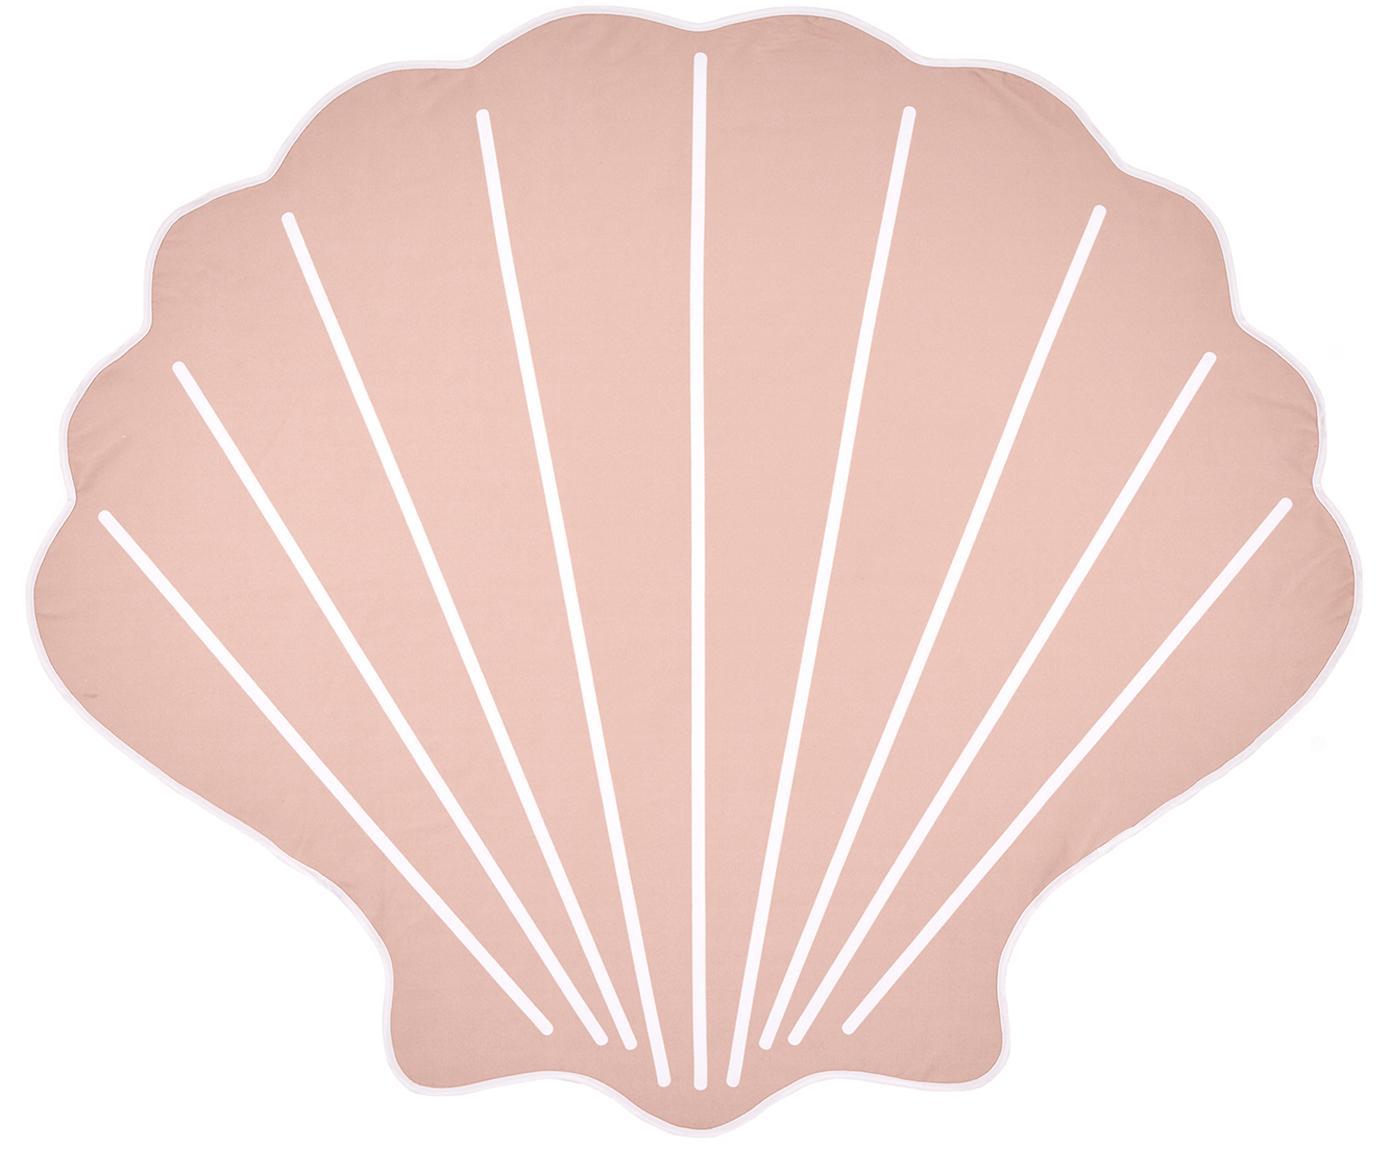 Toalla de playa Shelly, 55%poliéster, 45%algodón Gramaje ligero 340g/m², Rosa, blanco, An 150 x L 150 cm